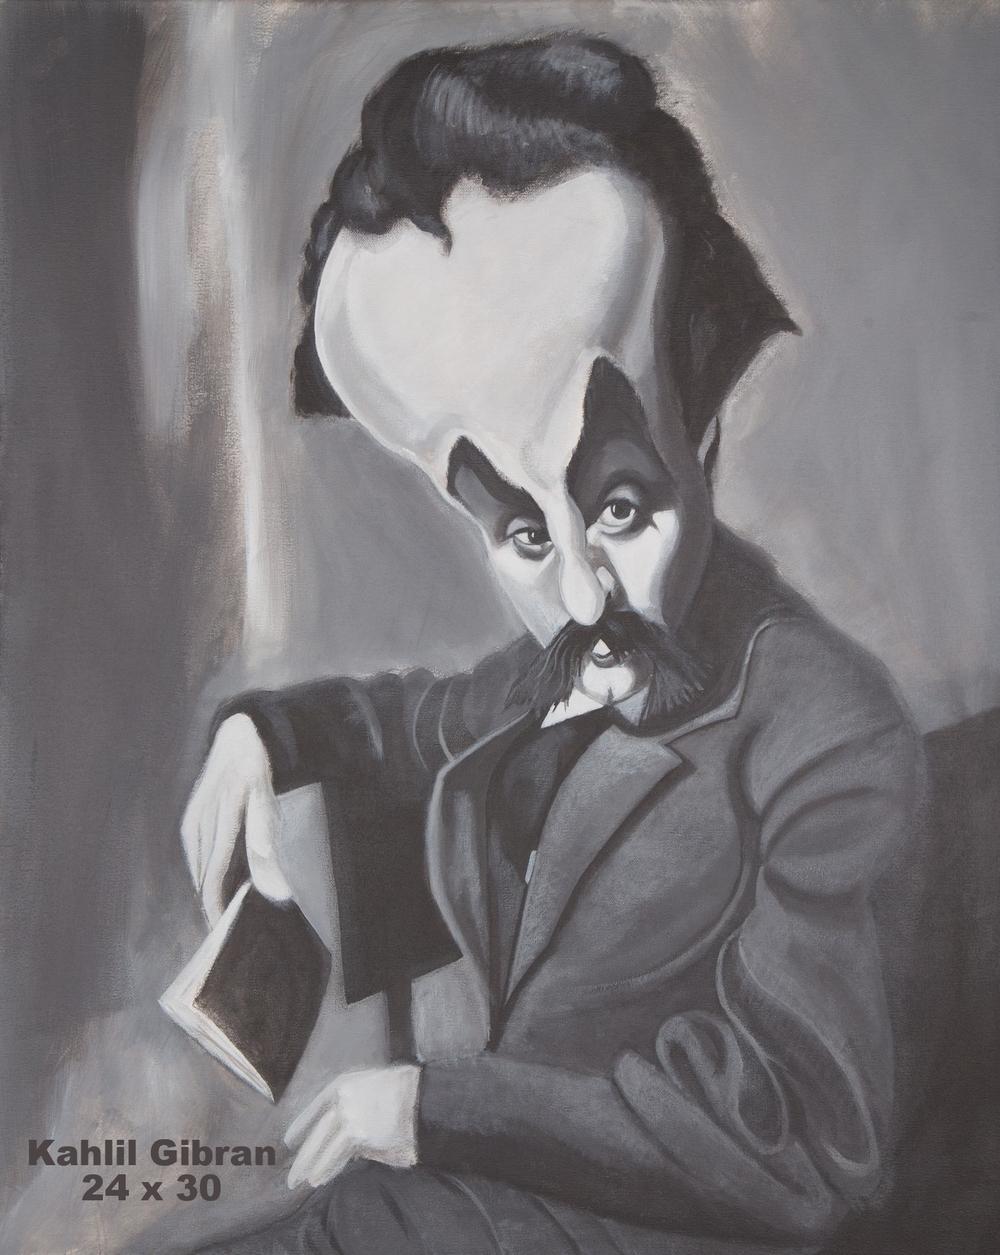 Kahlil Gibran 24 x 30.jpeg